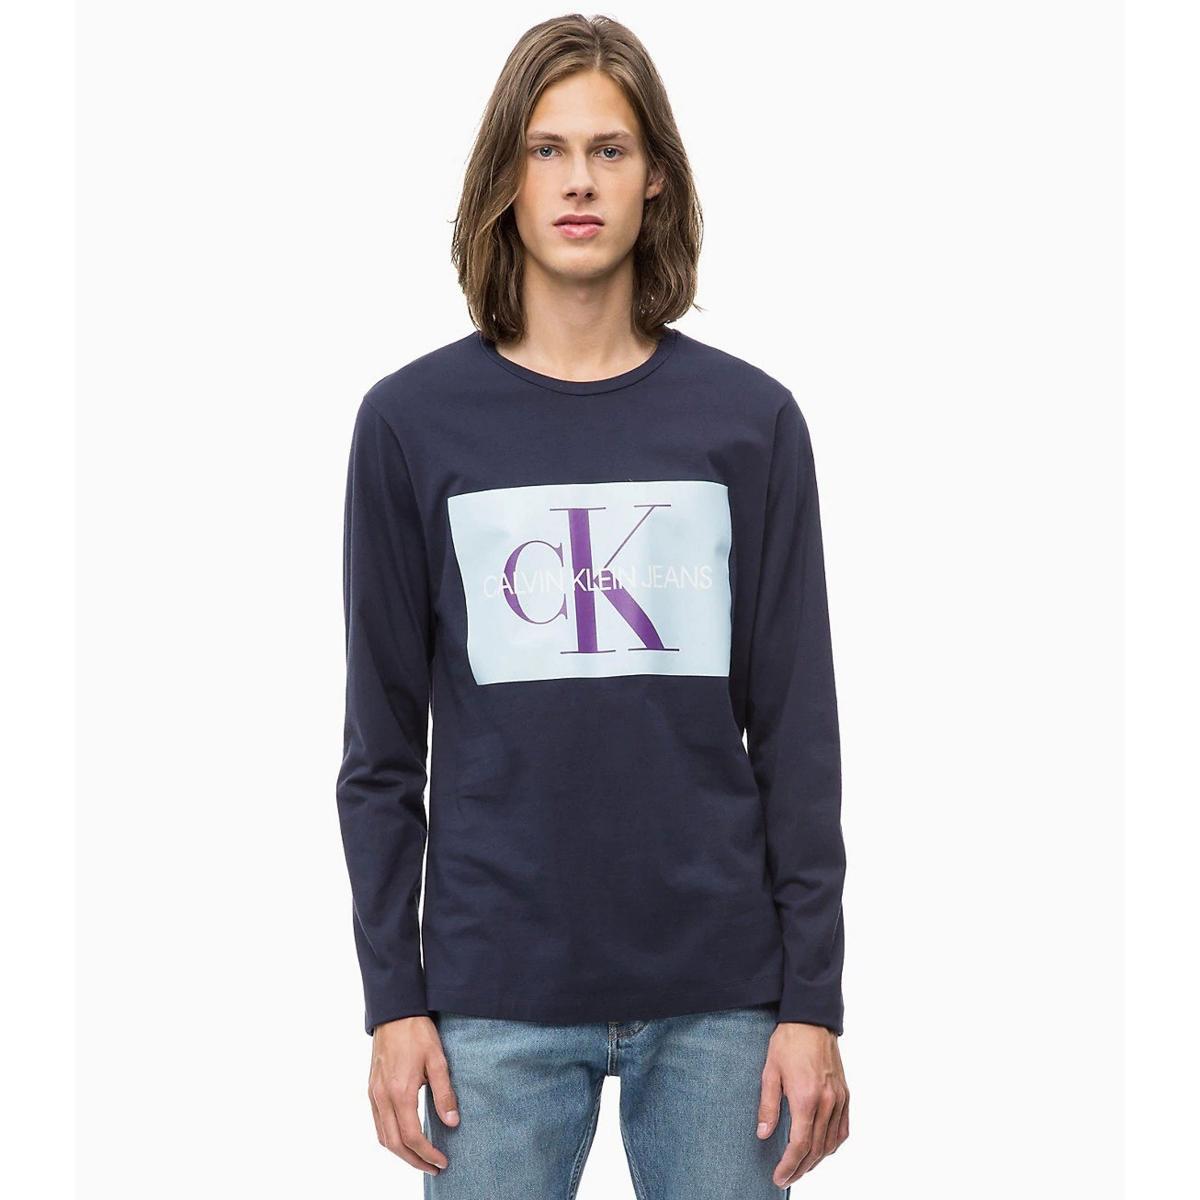 T-shirt a maniche lunghe Calvin Klein Jeans con logo da uomo rif. J30J309600